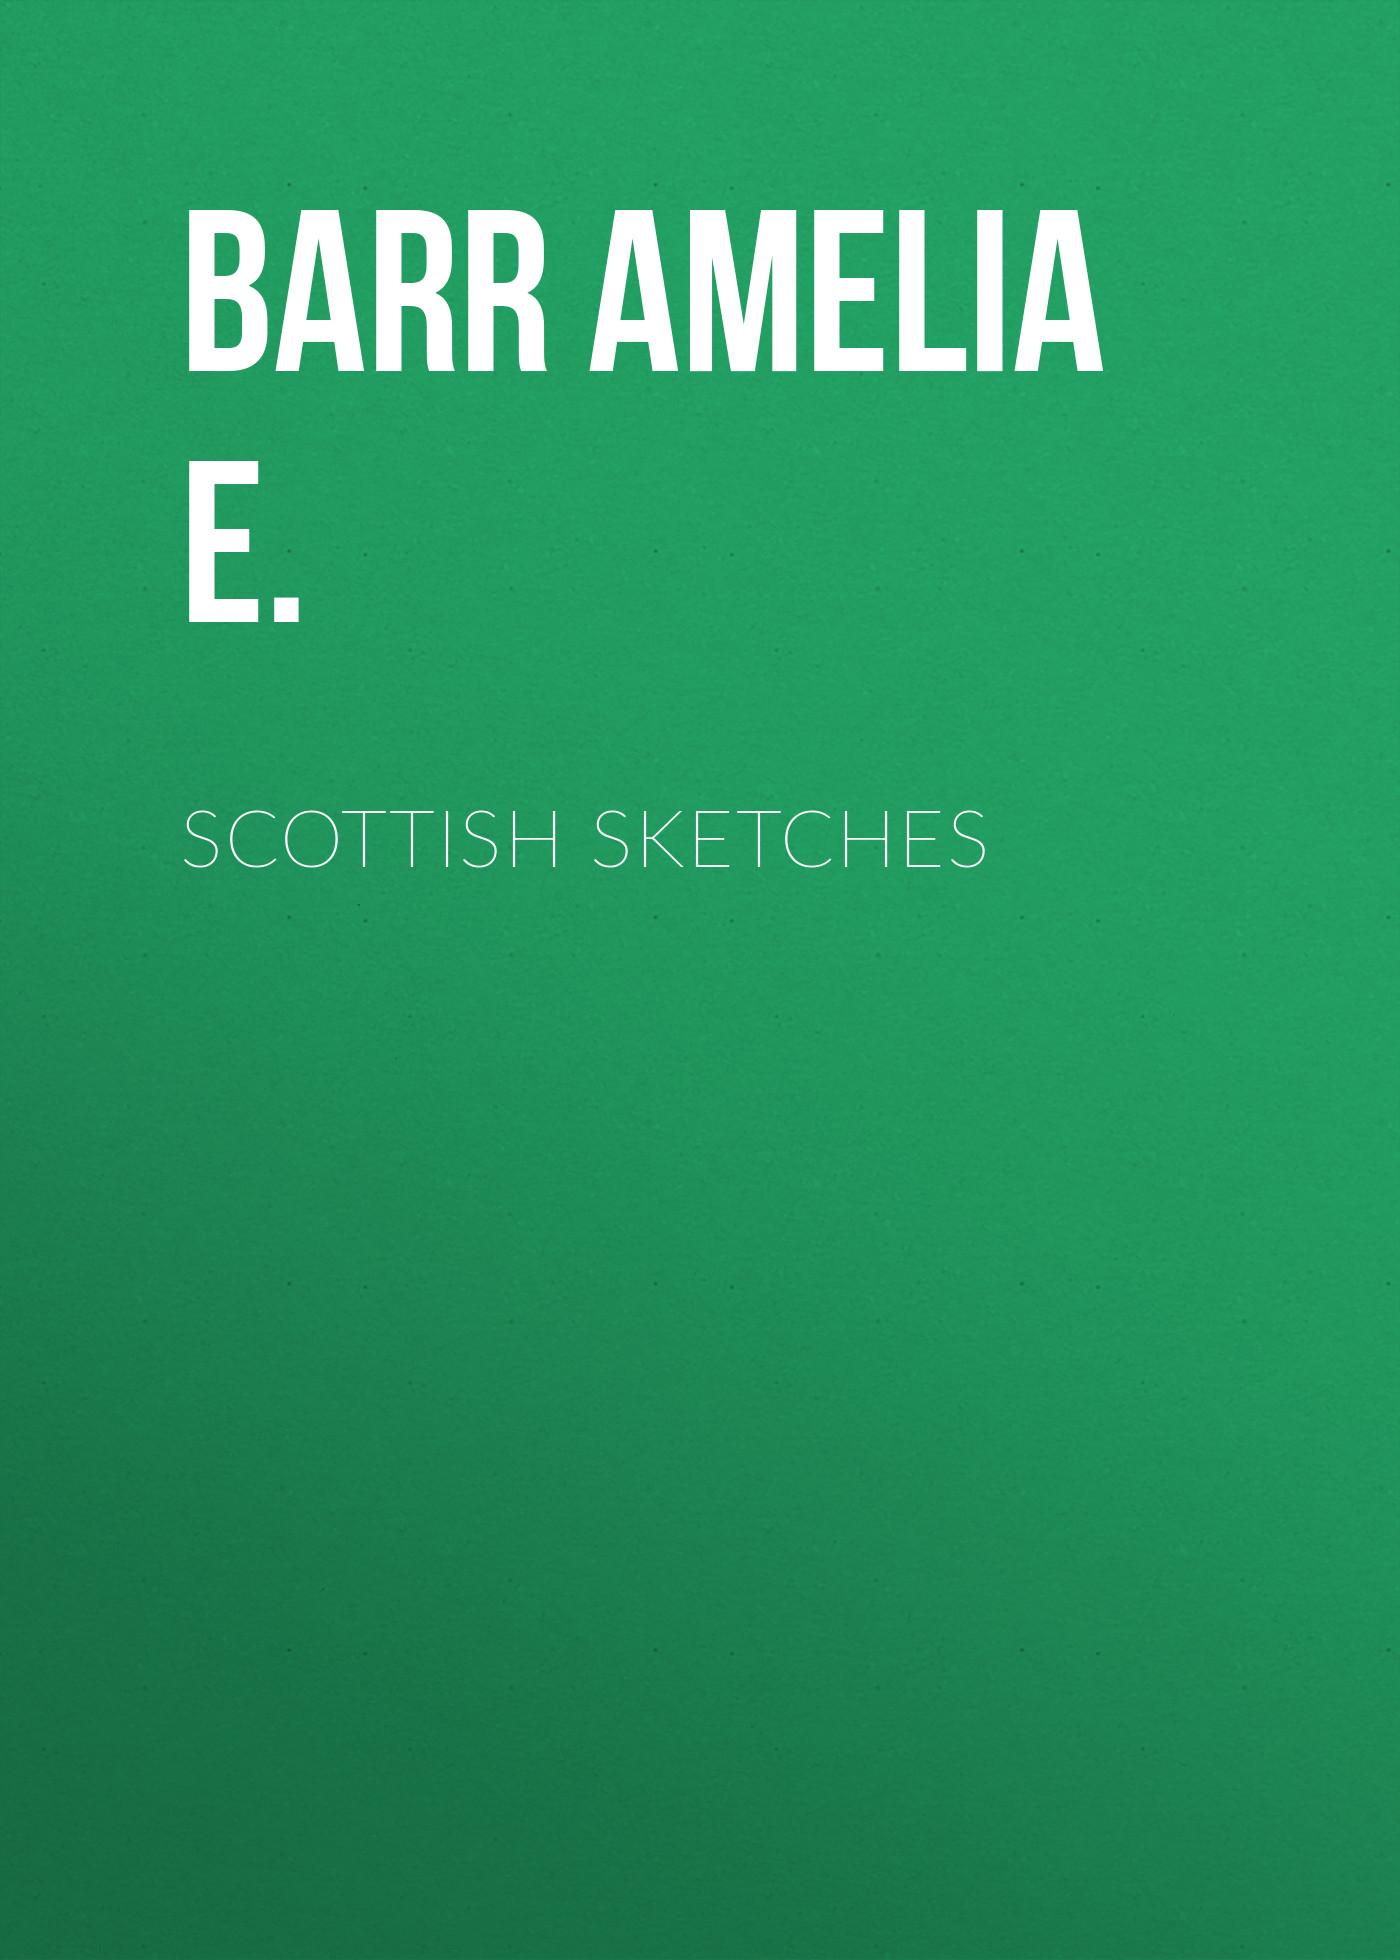 Barr Amelia E. Scottish sketches цена